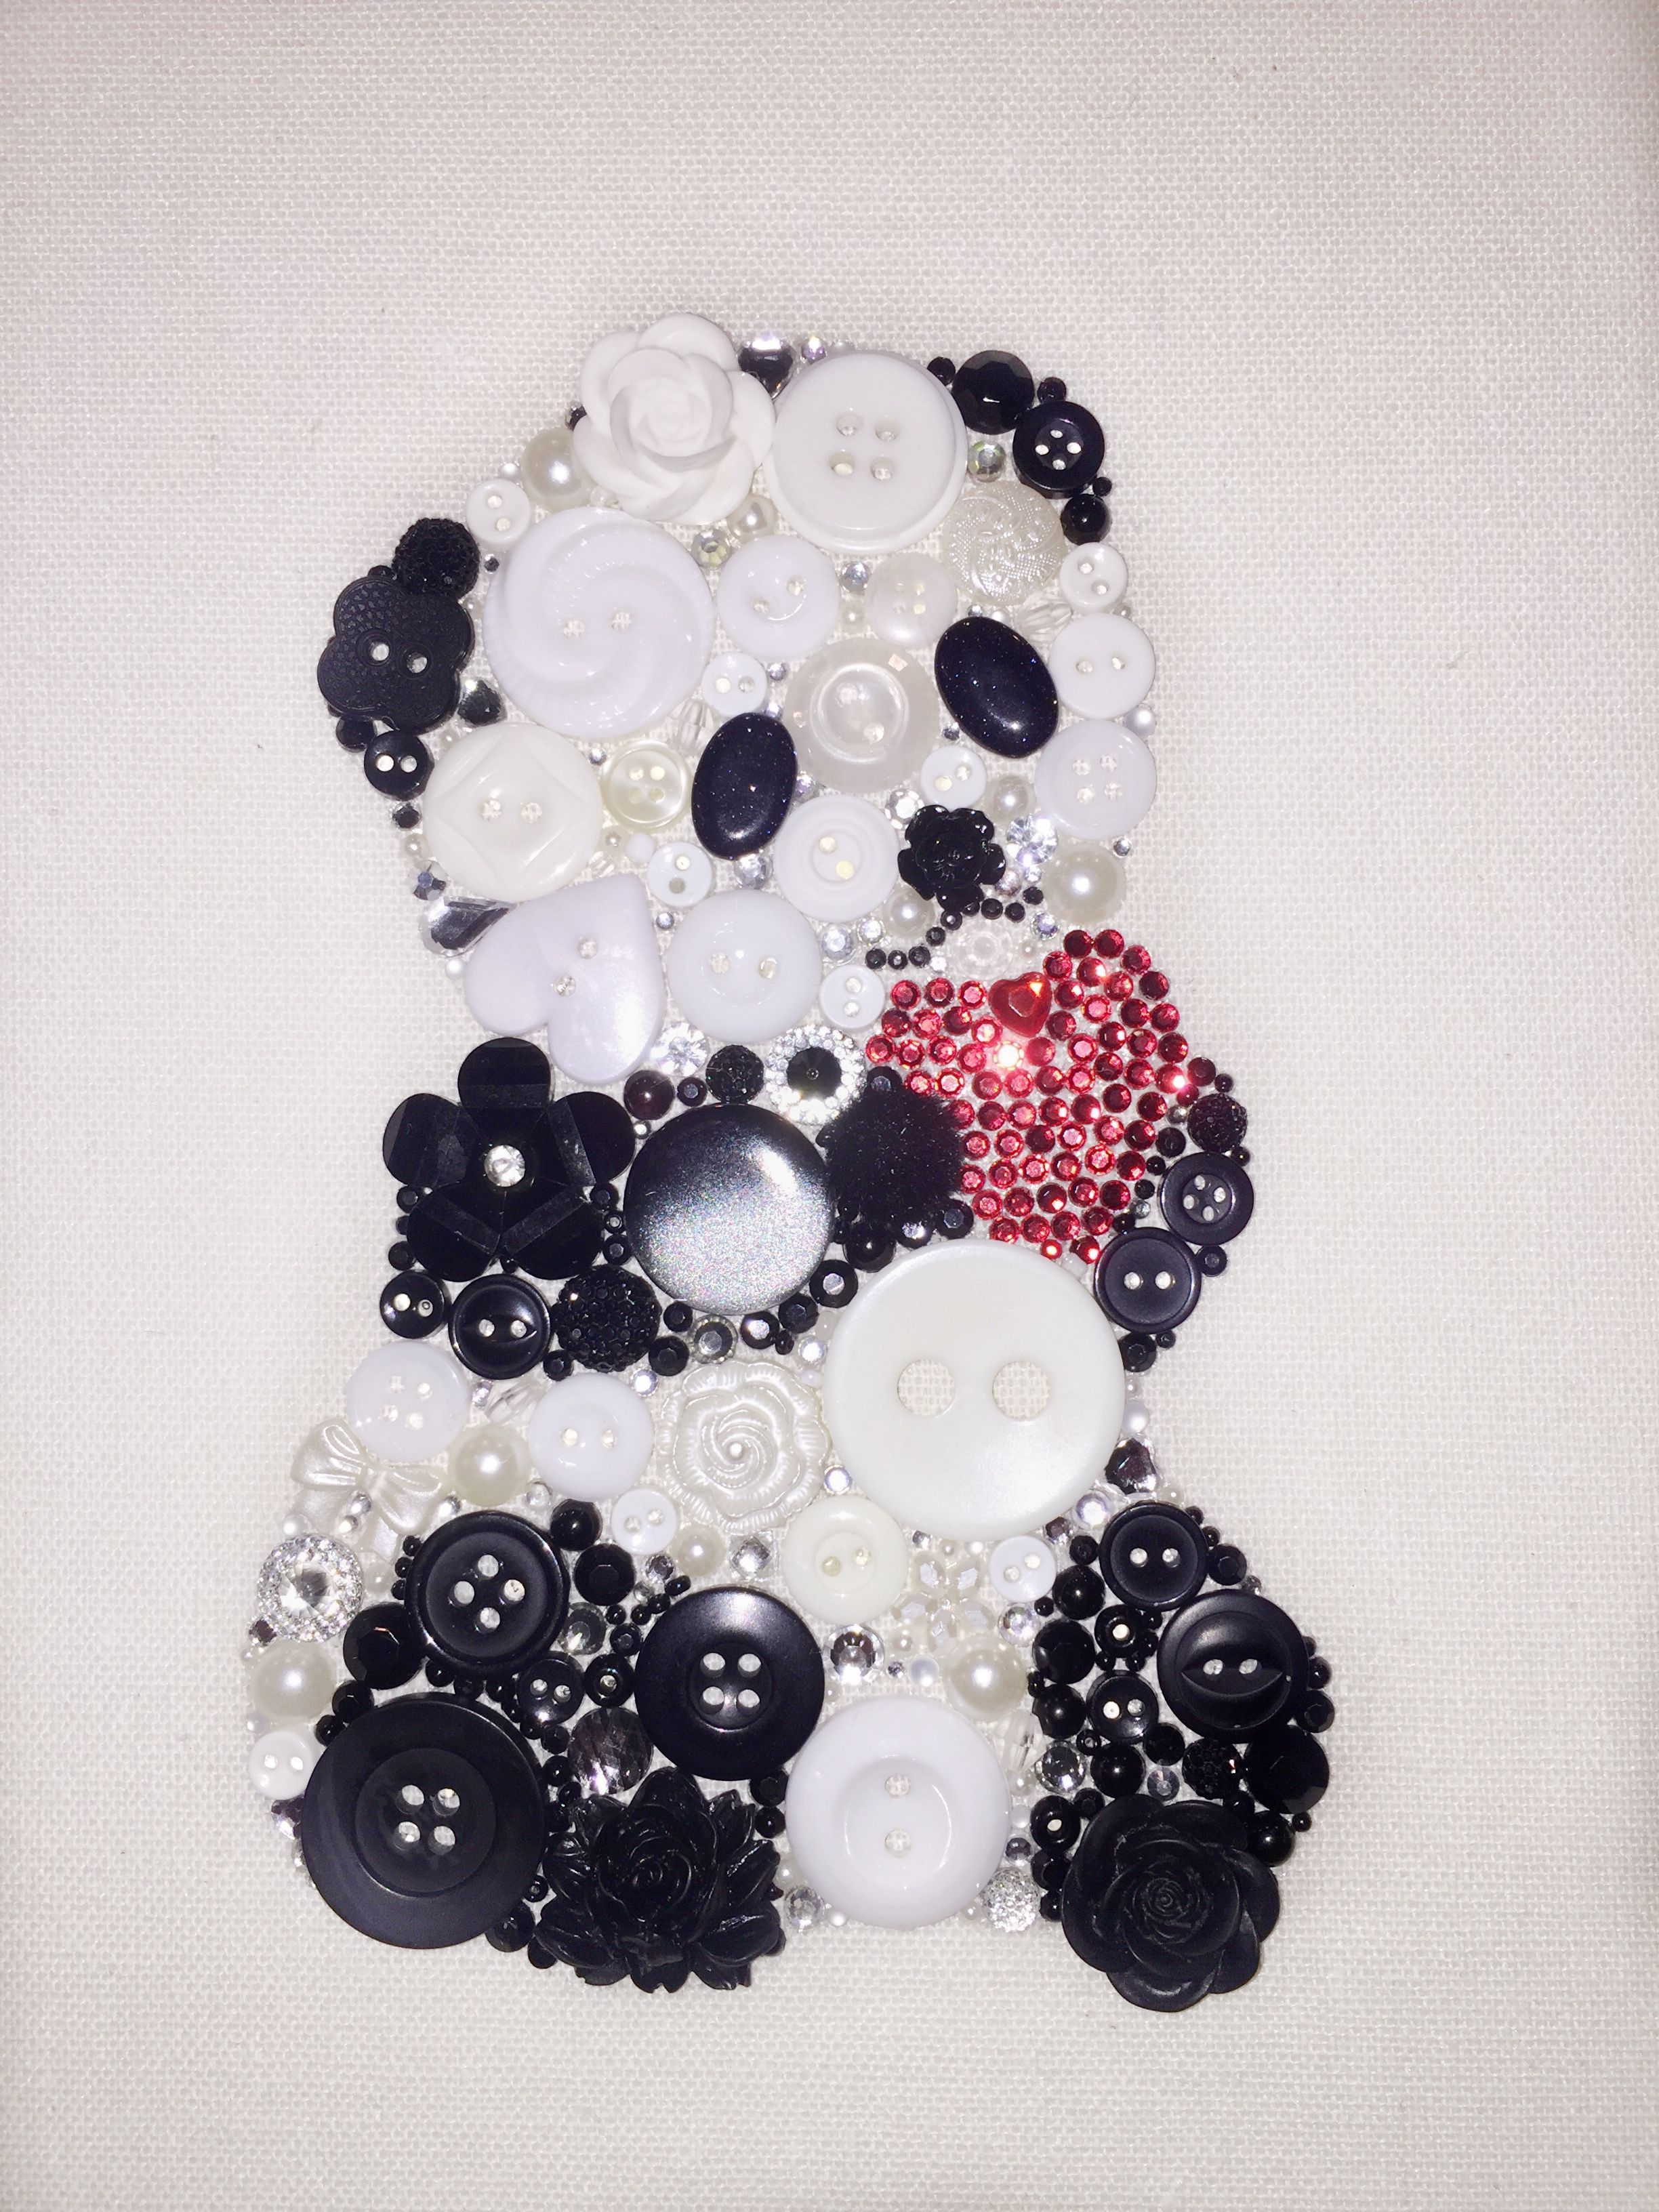 Panda Button Art 9x9 Canvas Wall Art Valentines Day T